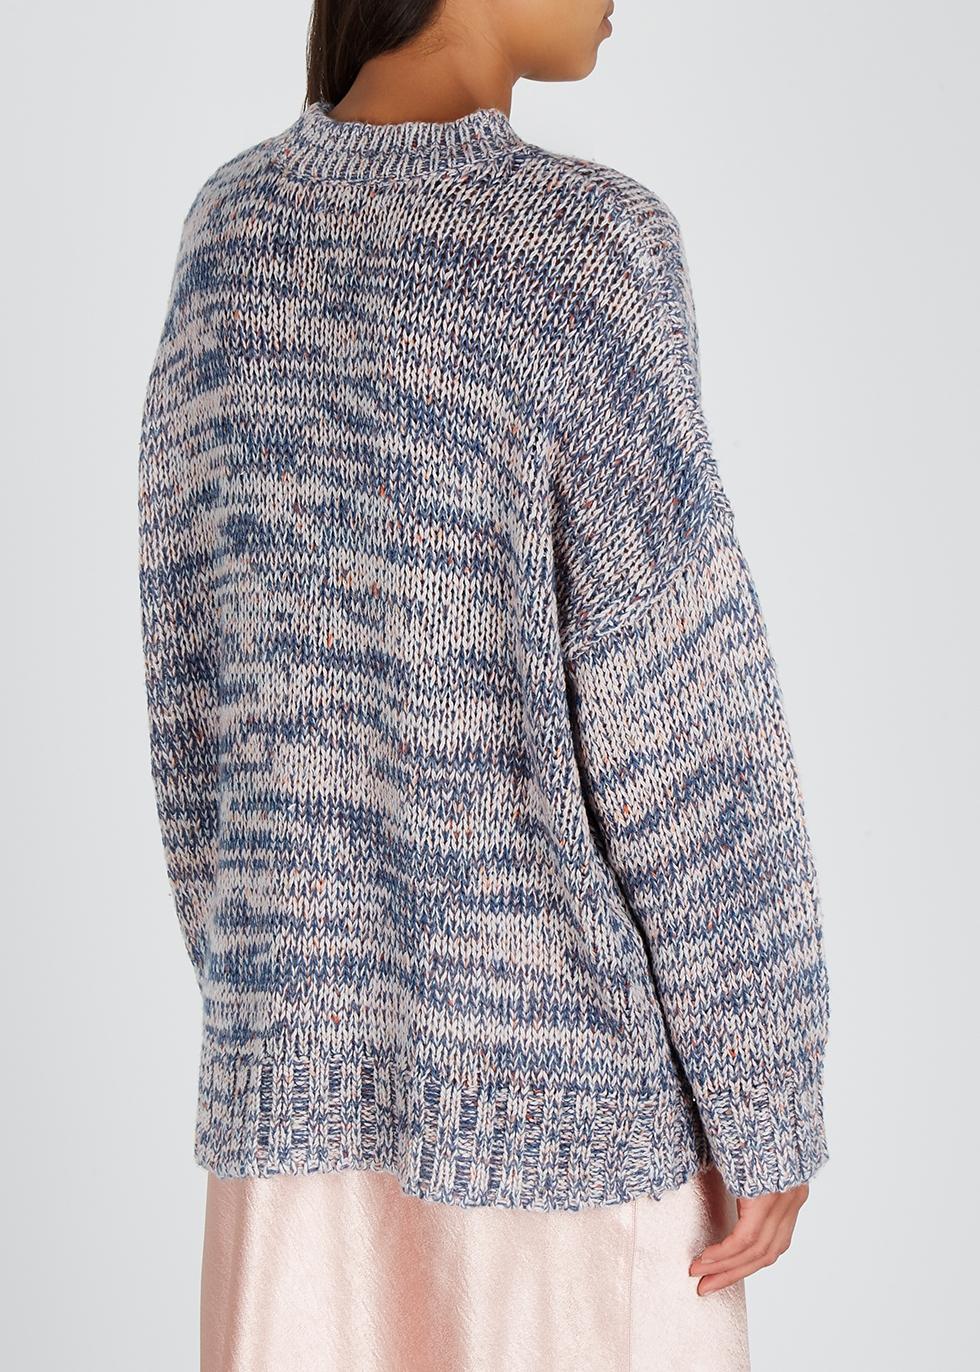 Hackney chunky-knit jumper - Oneteaspoon